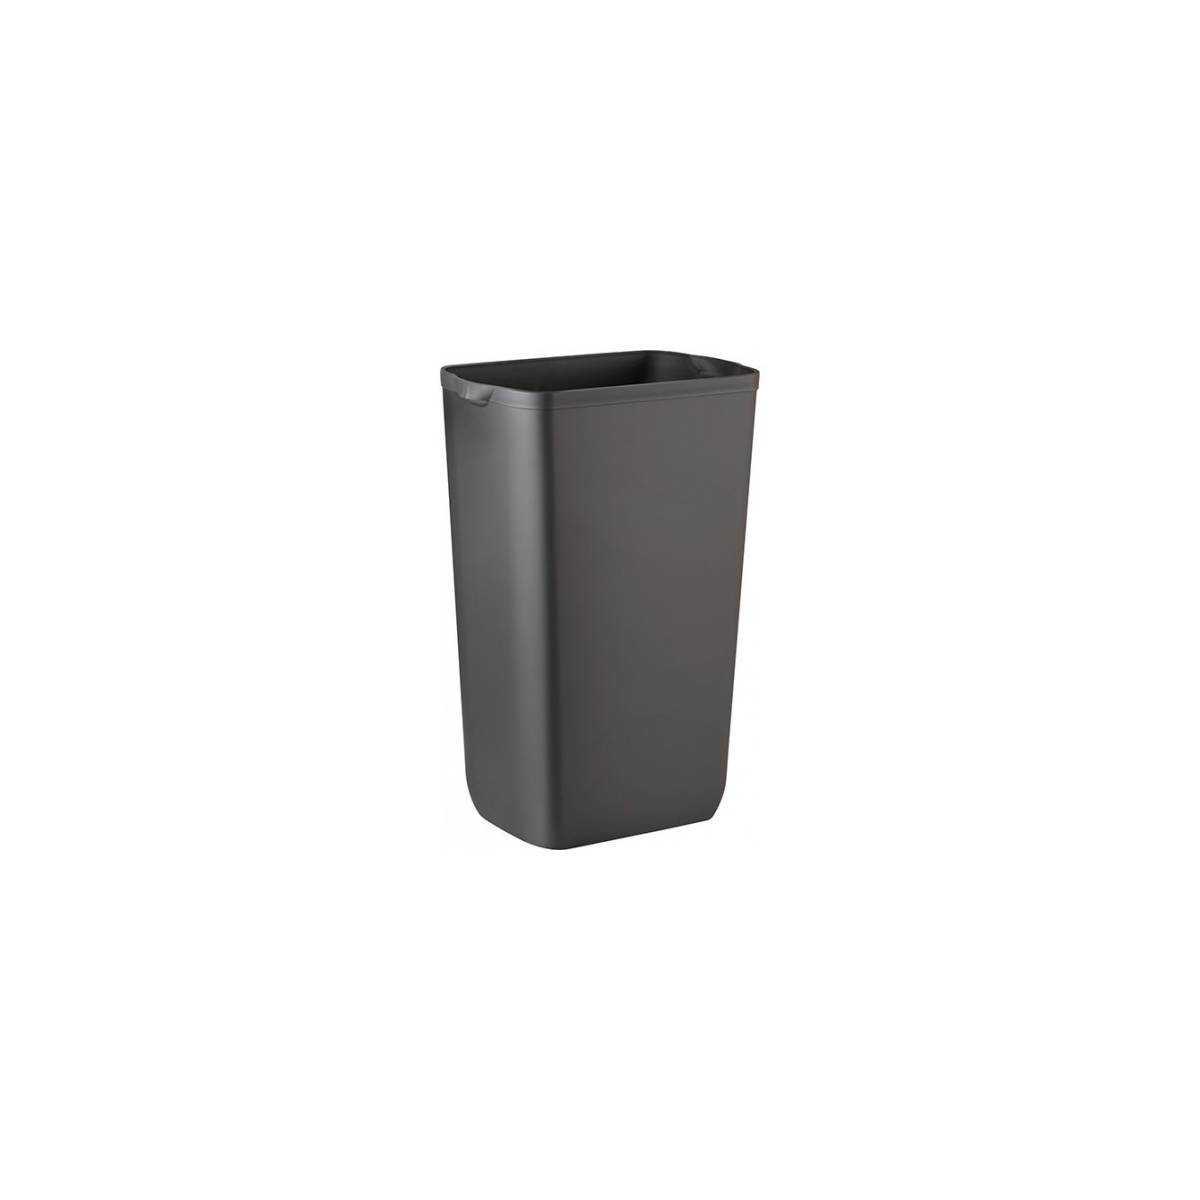 Урна для мусора 23л COLORED (A74201NE) A74201NE Mar Plast